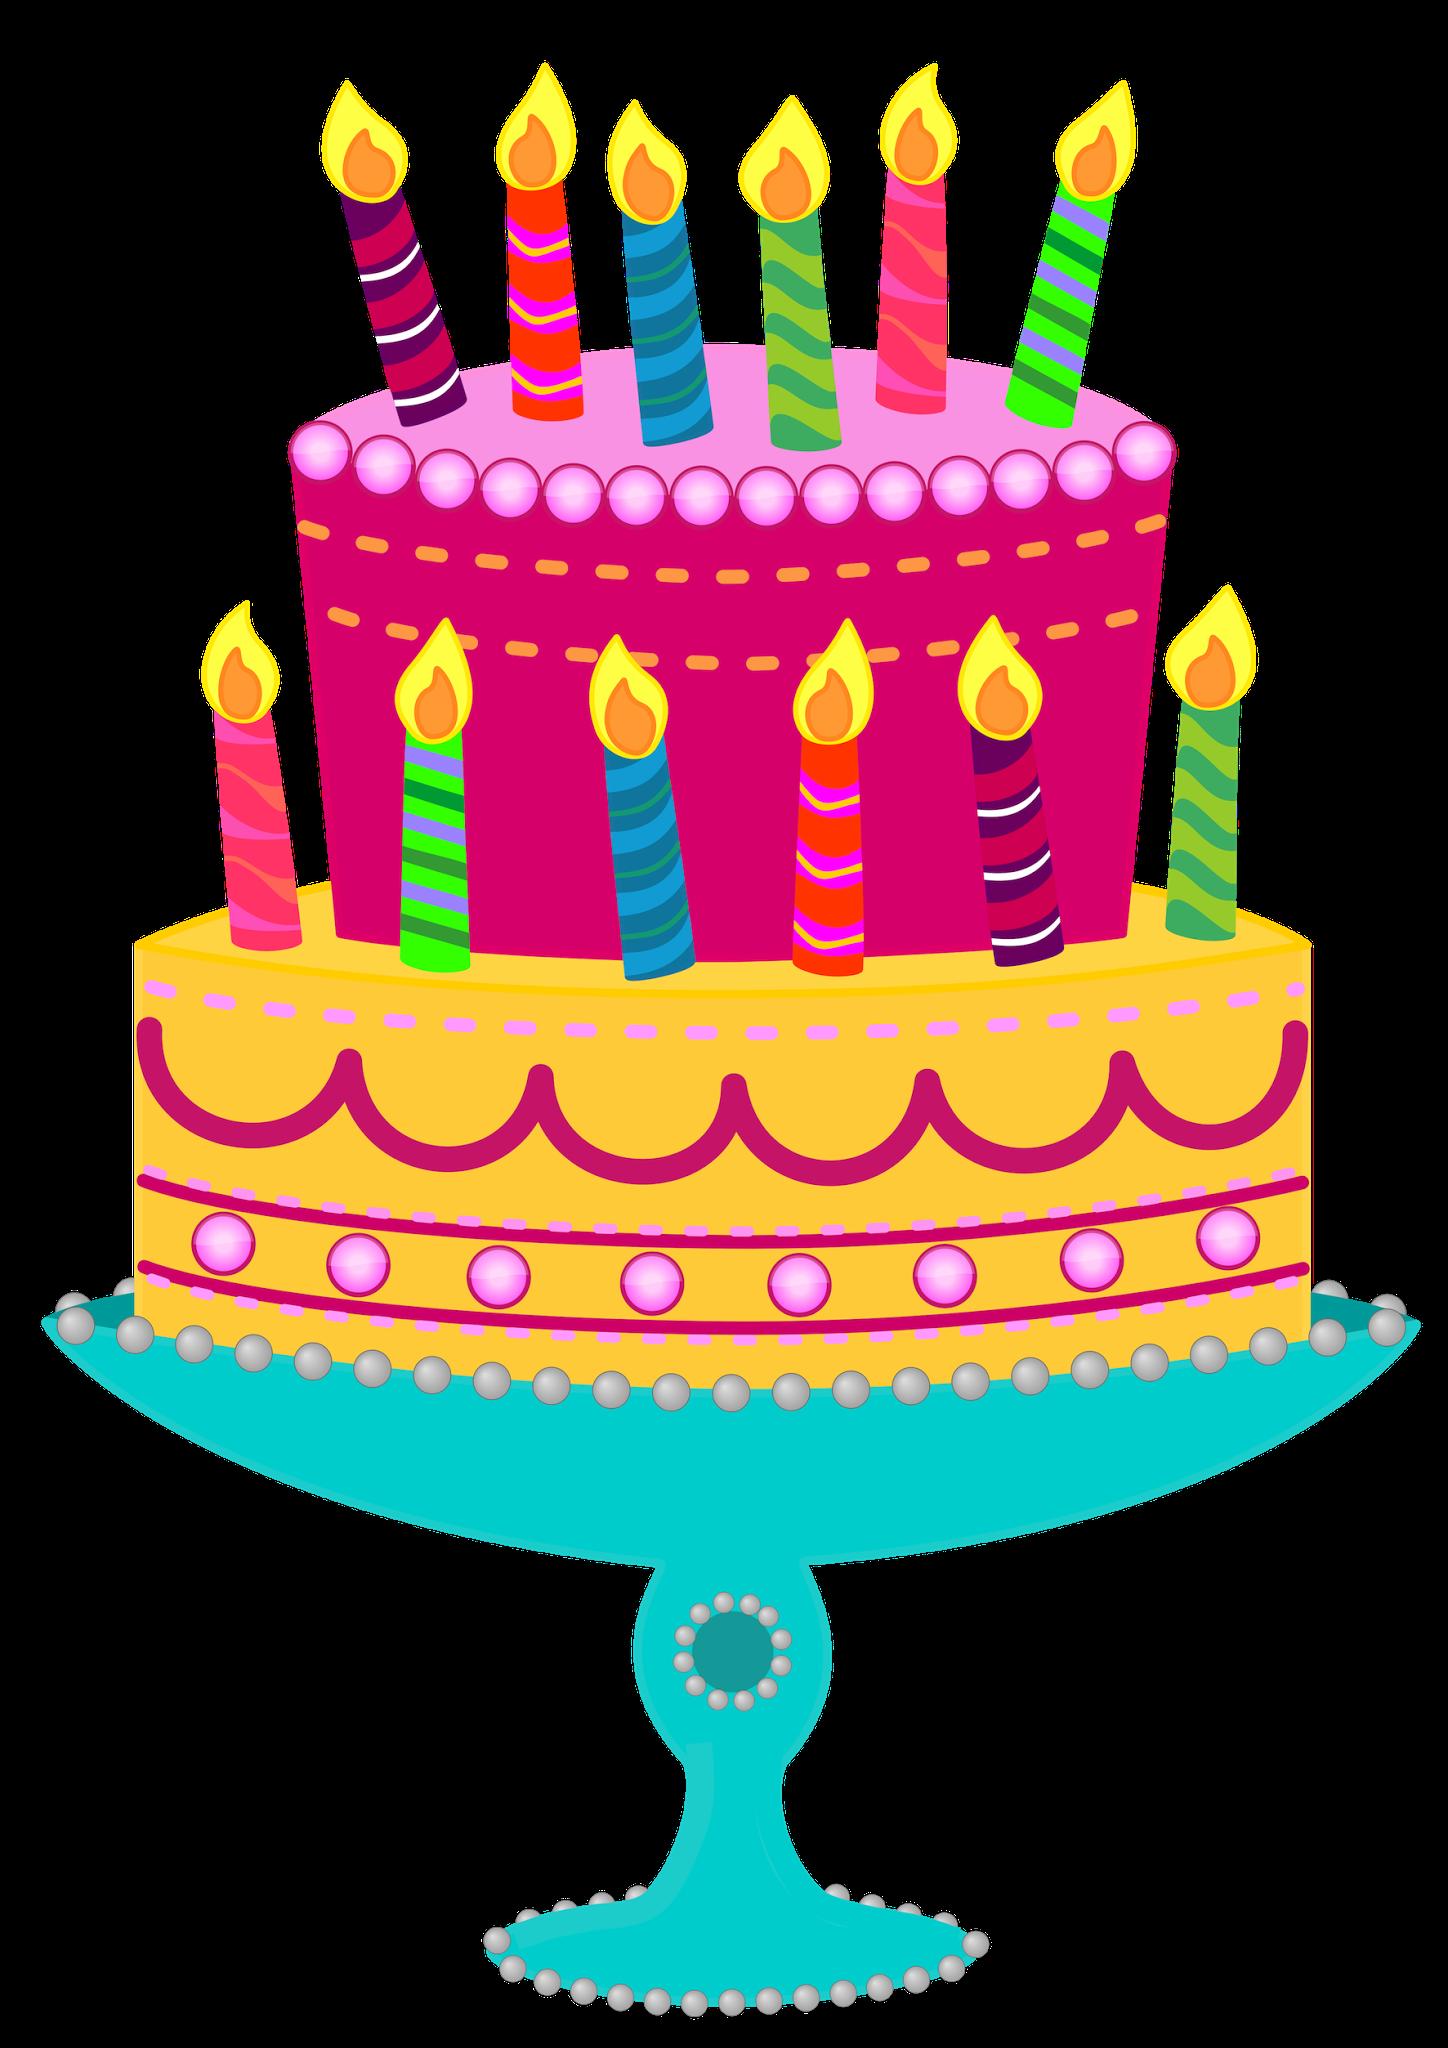 Clipart cake whimsical. Birthday clip art cakes